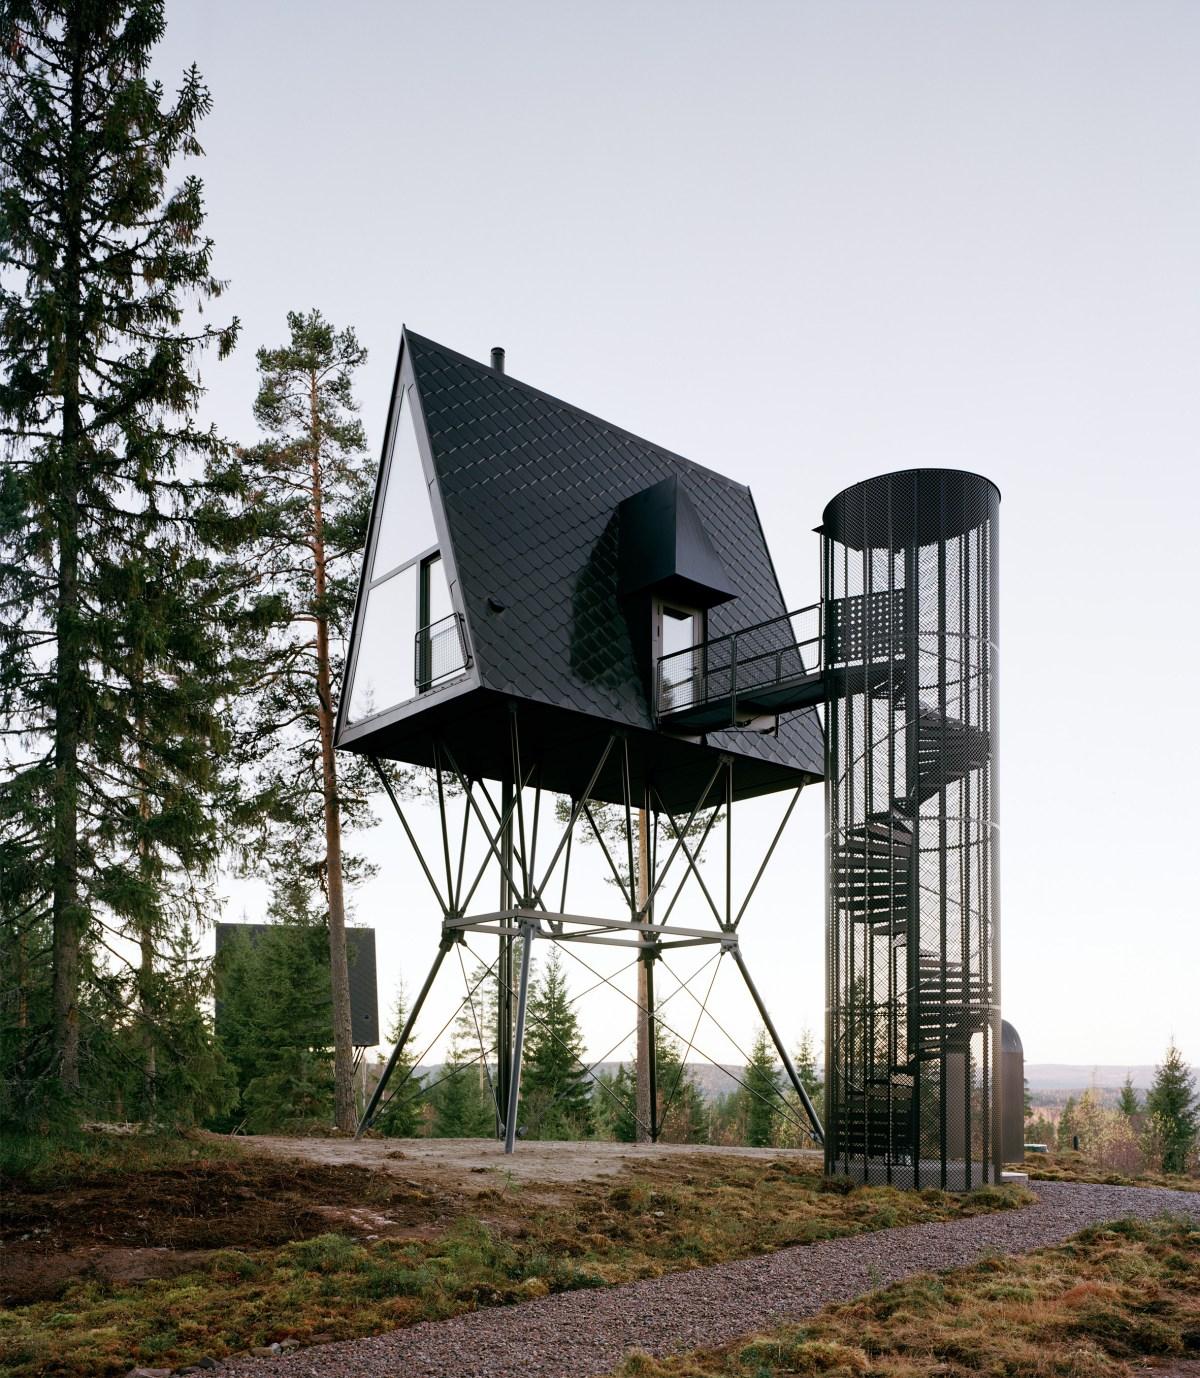 pan-treetop-cabins-espen-surnevik-woodland-architecture-norway-_dezeen_2364_col_9